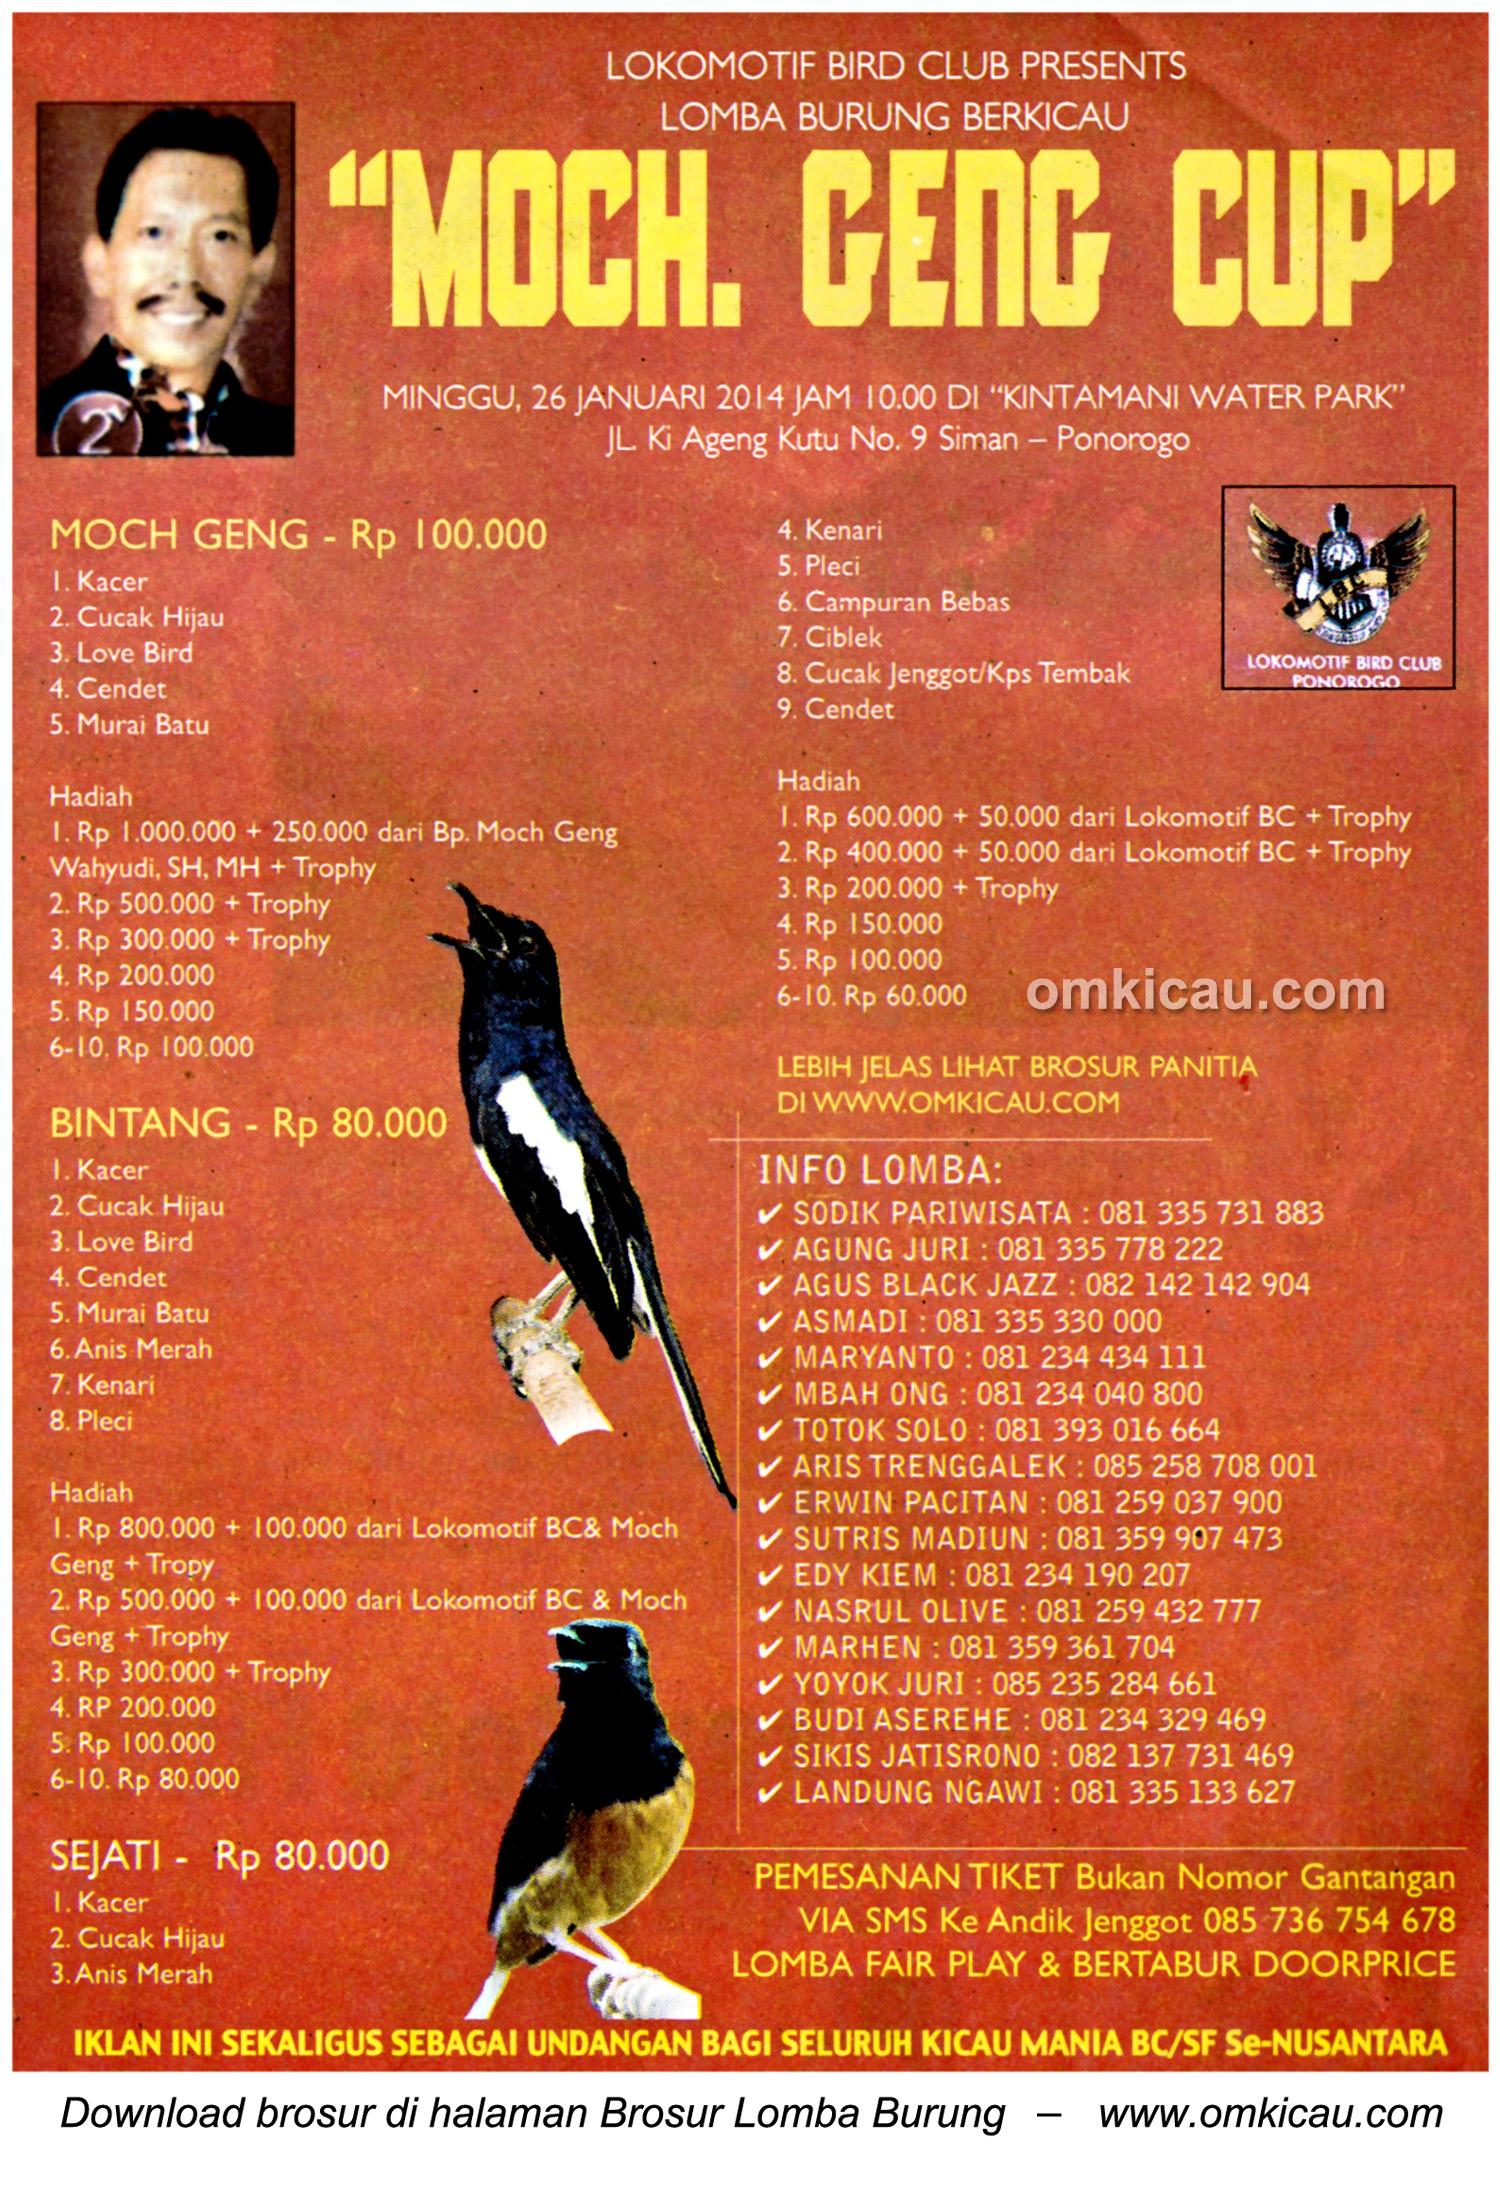 Brosur Lomba Burung Berkicau Moch Ceng Cup, Ponorogo, 26 Januari 2014